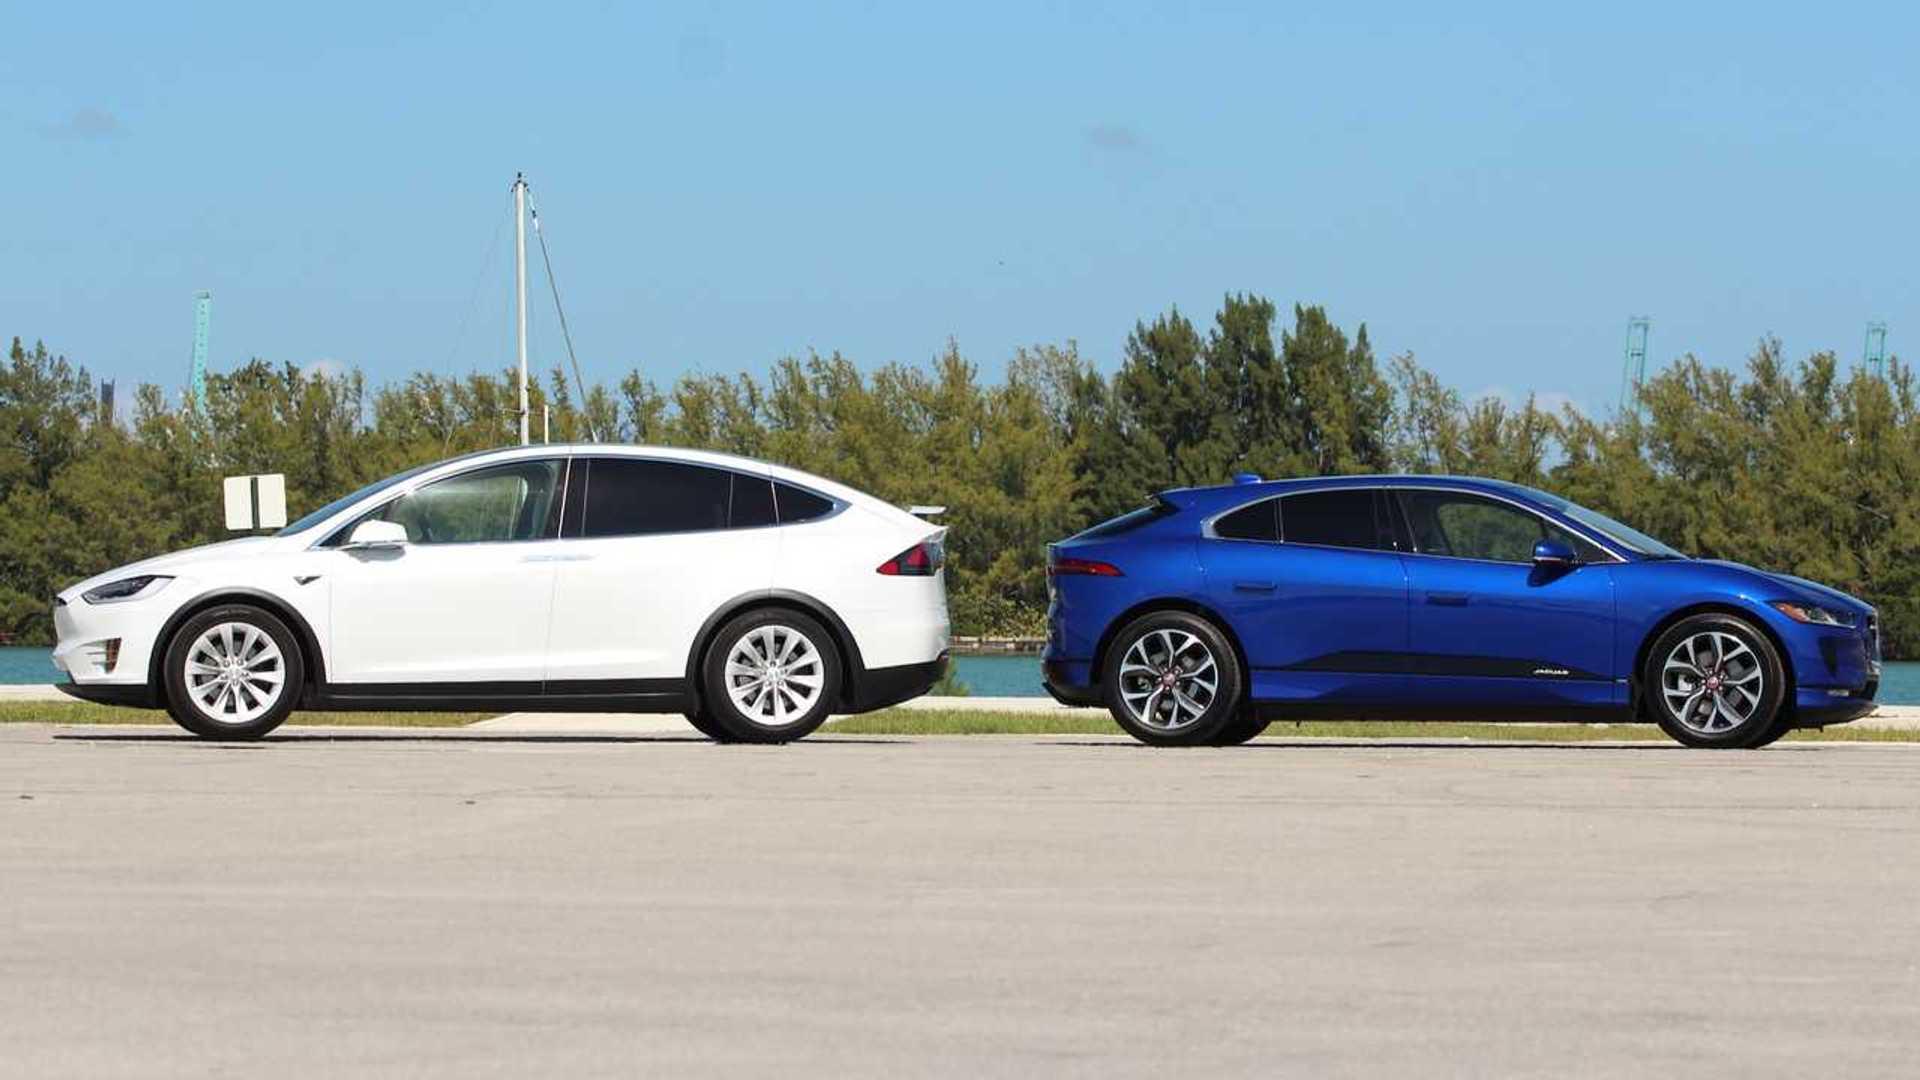 2019 Jaguar I-Pace Vs  2018 Tesla Model X Comparison: Cat Nipped